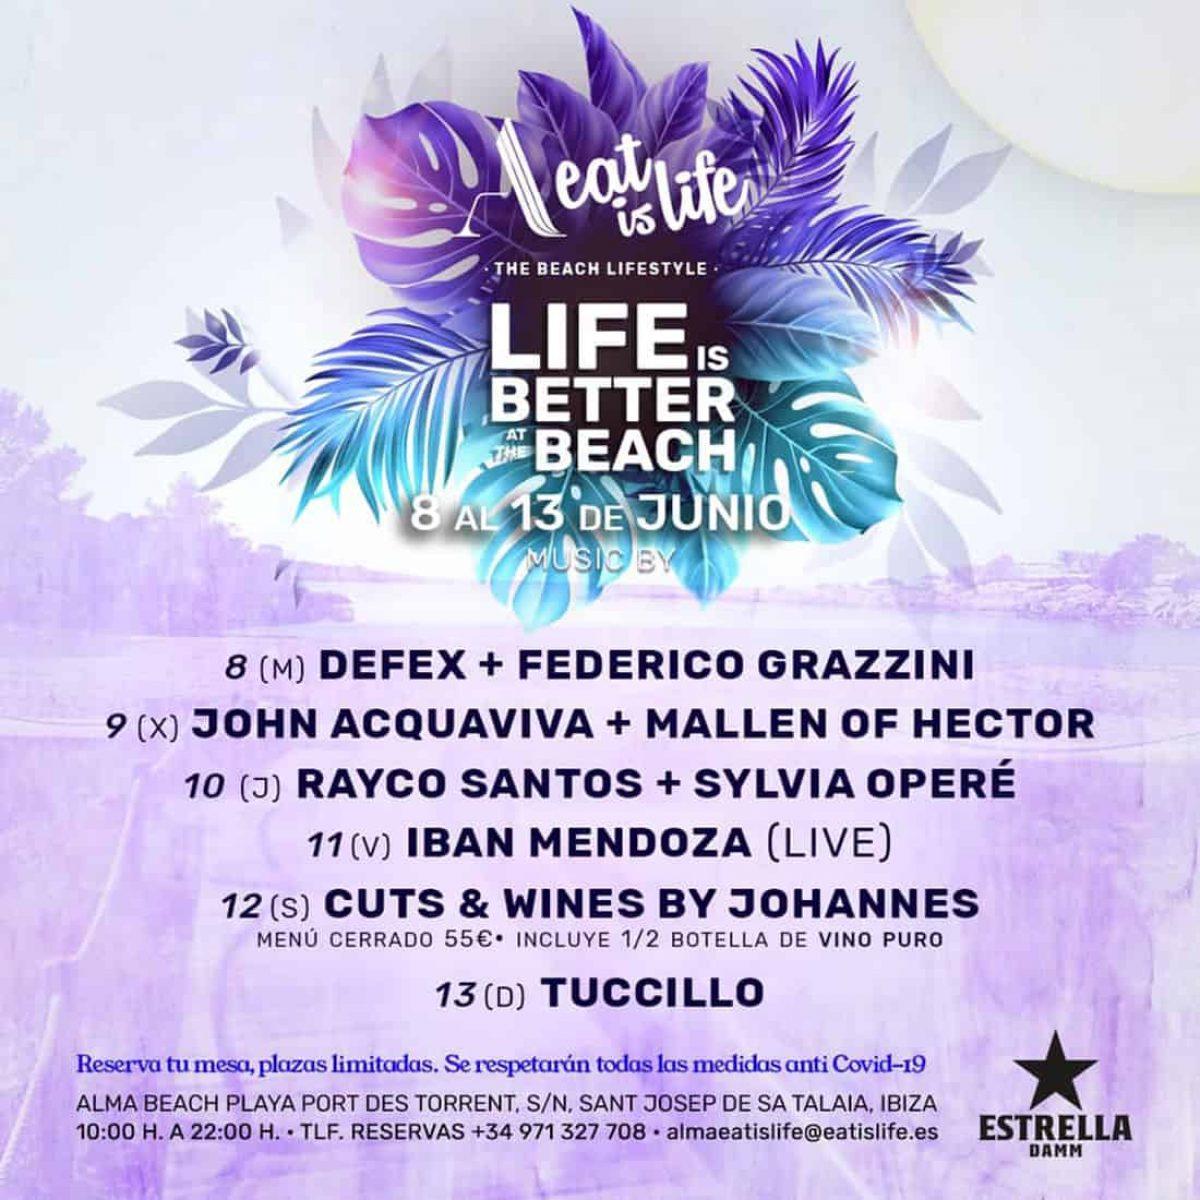 alma-eat-is-life-ibiza-2021-juin-music-welcometoibiza